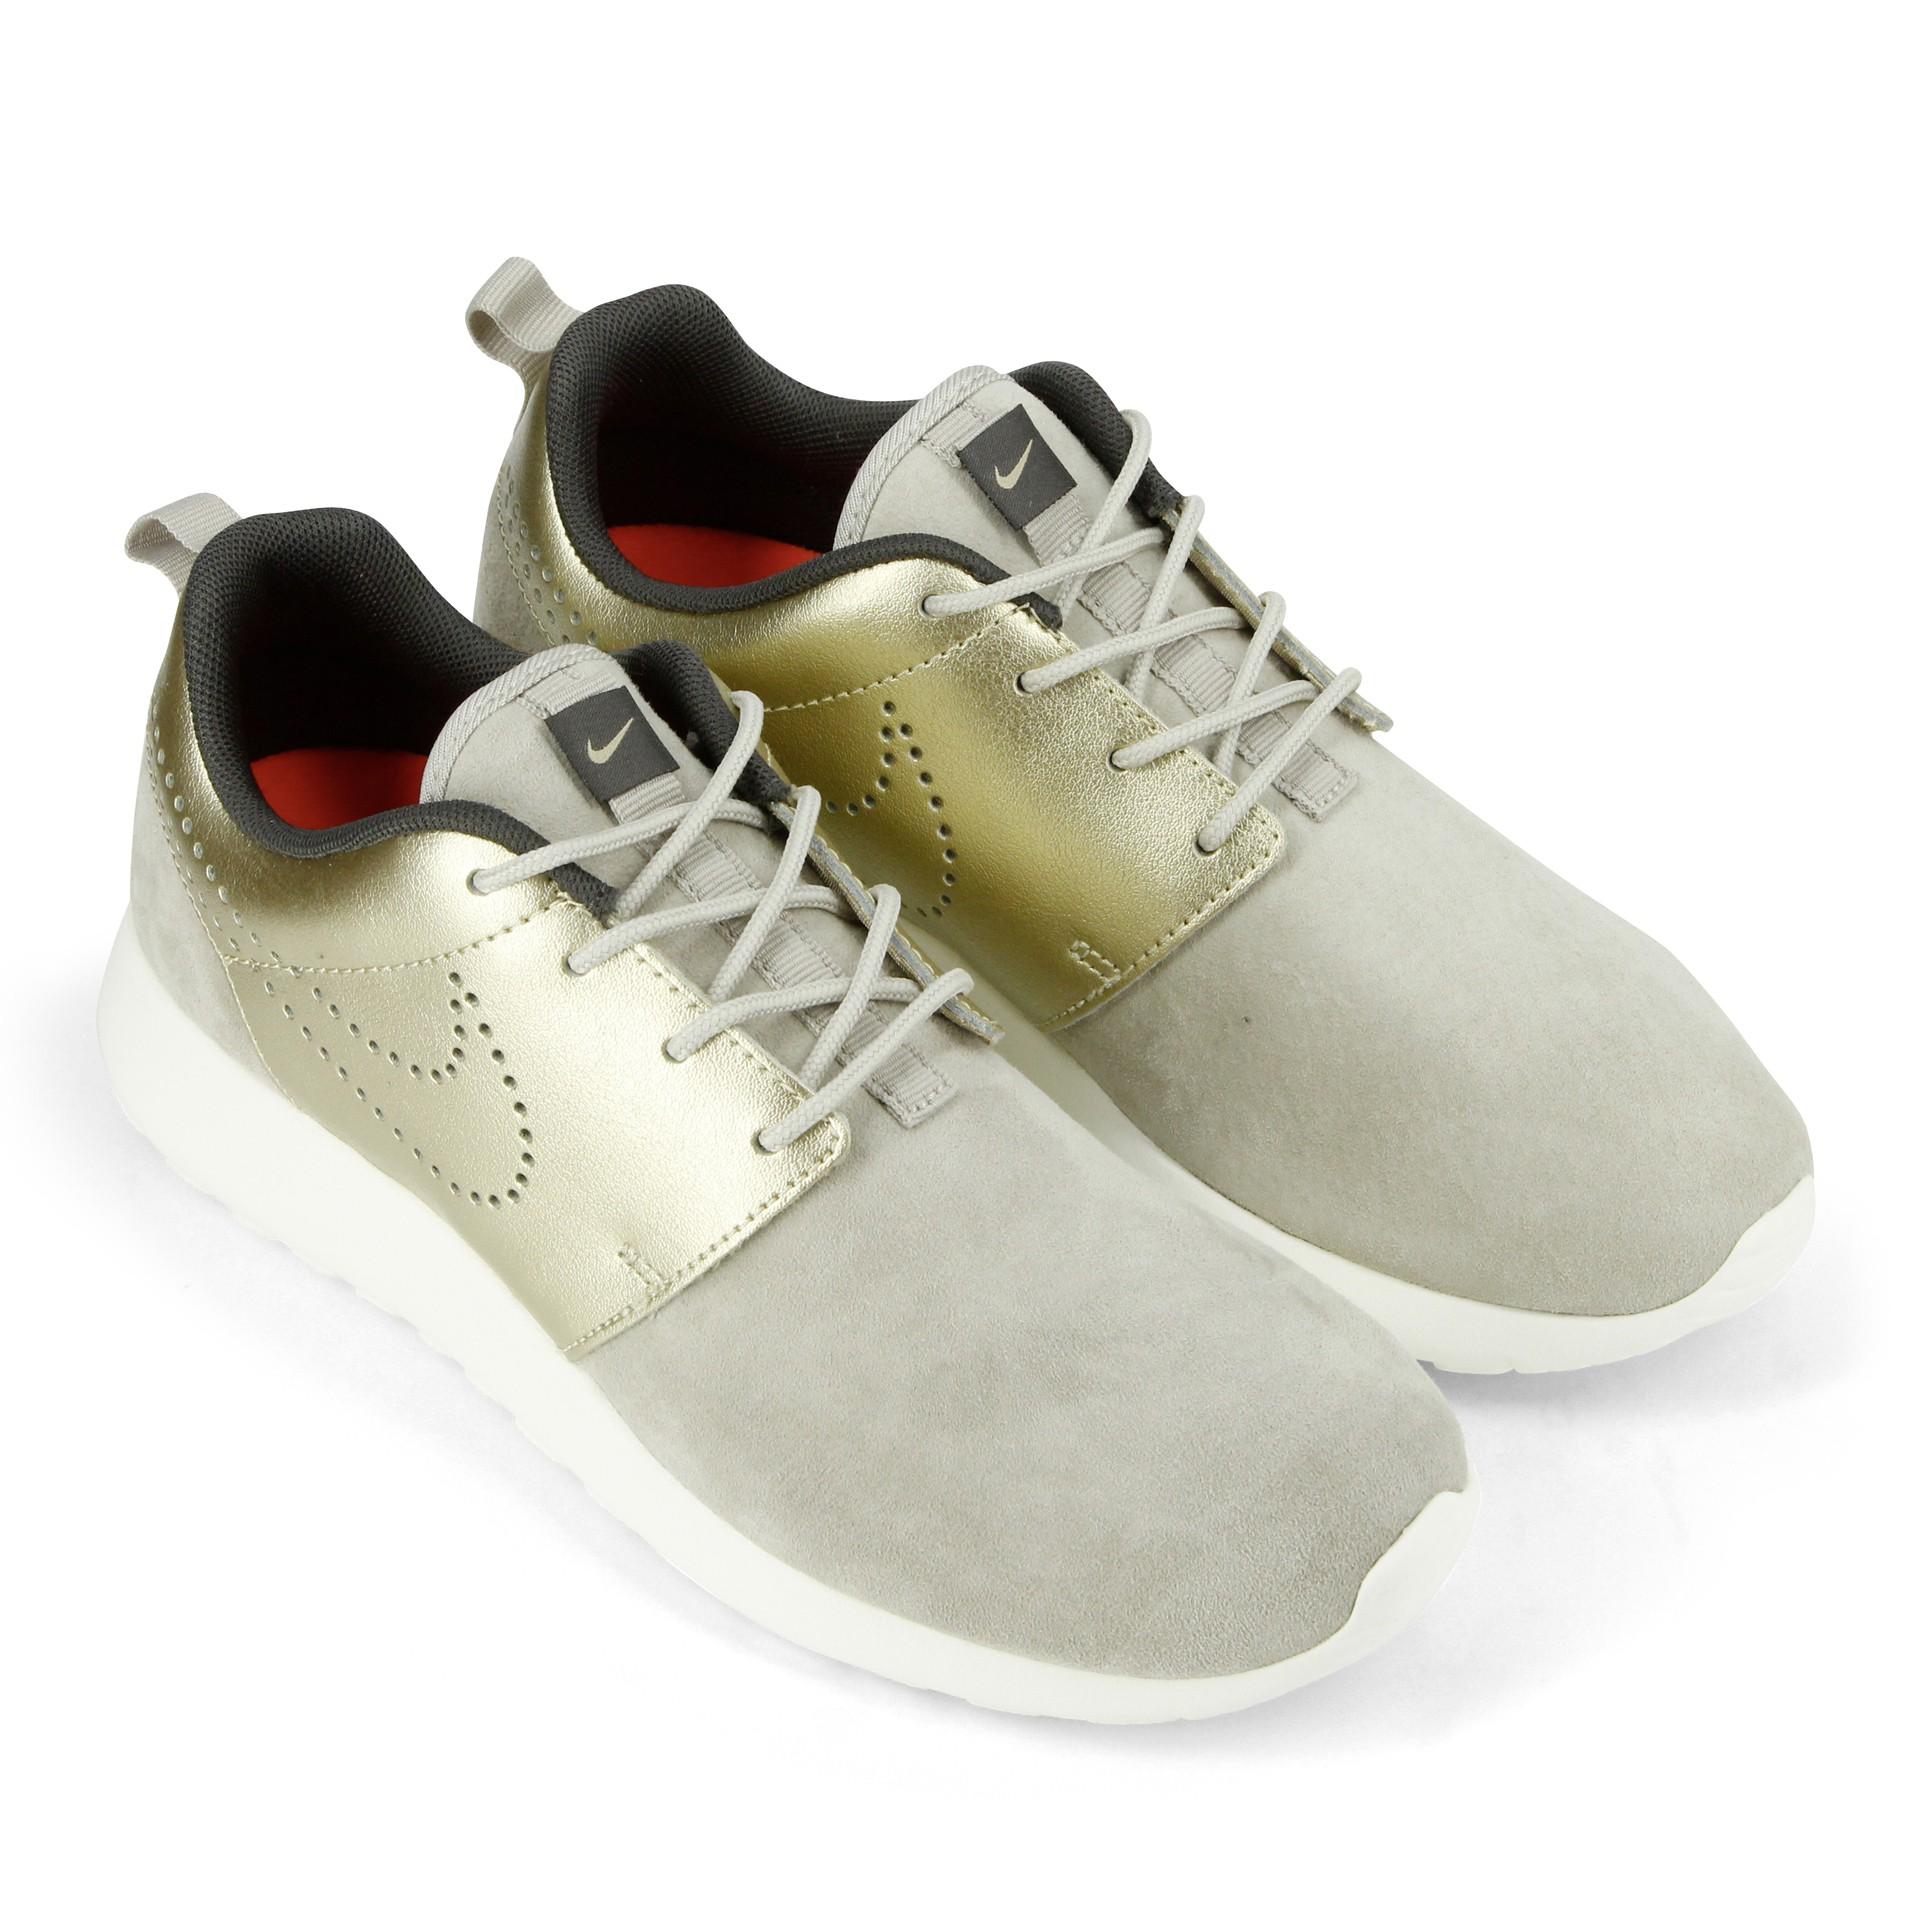 online store c05dc 29ff5 Nouveau Nike Roshe One Femme Grossiste Tea2520